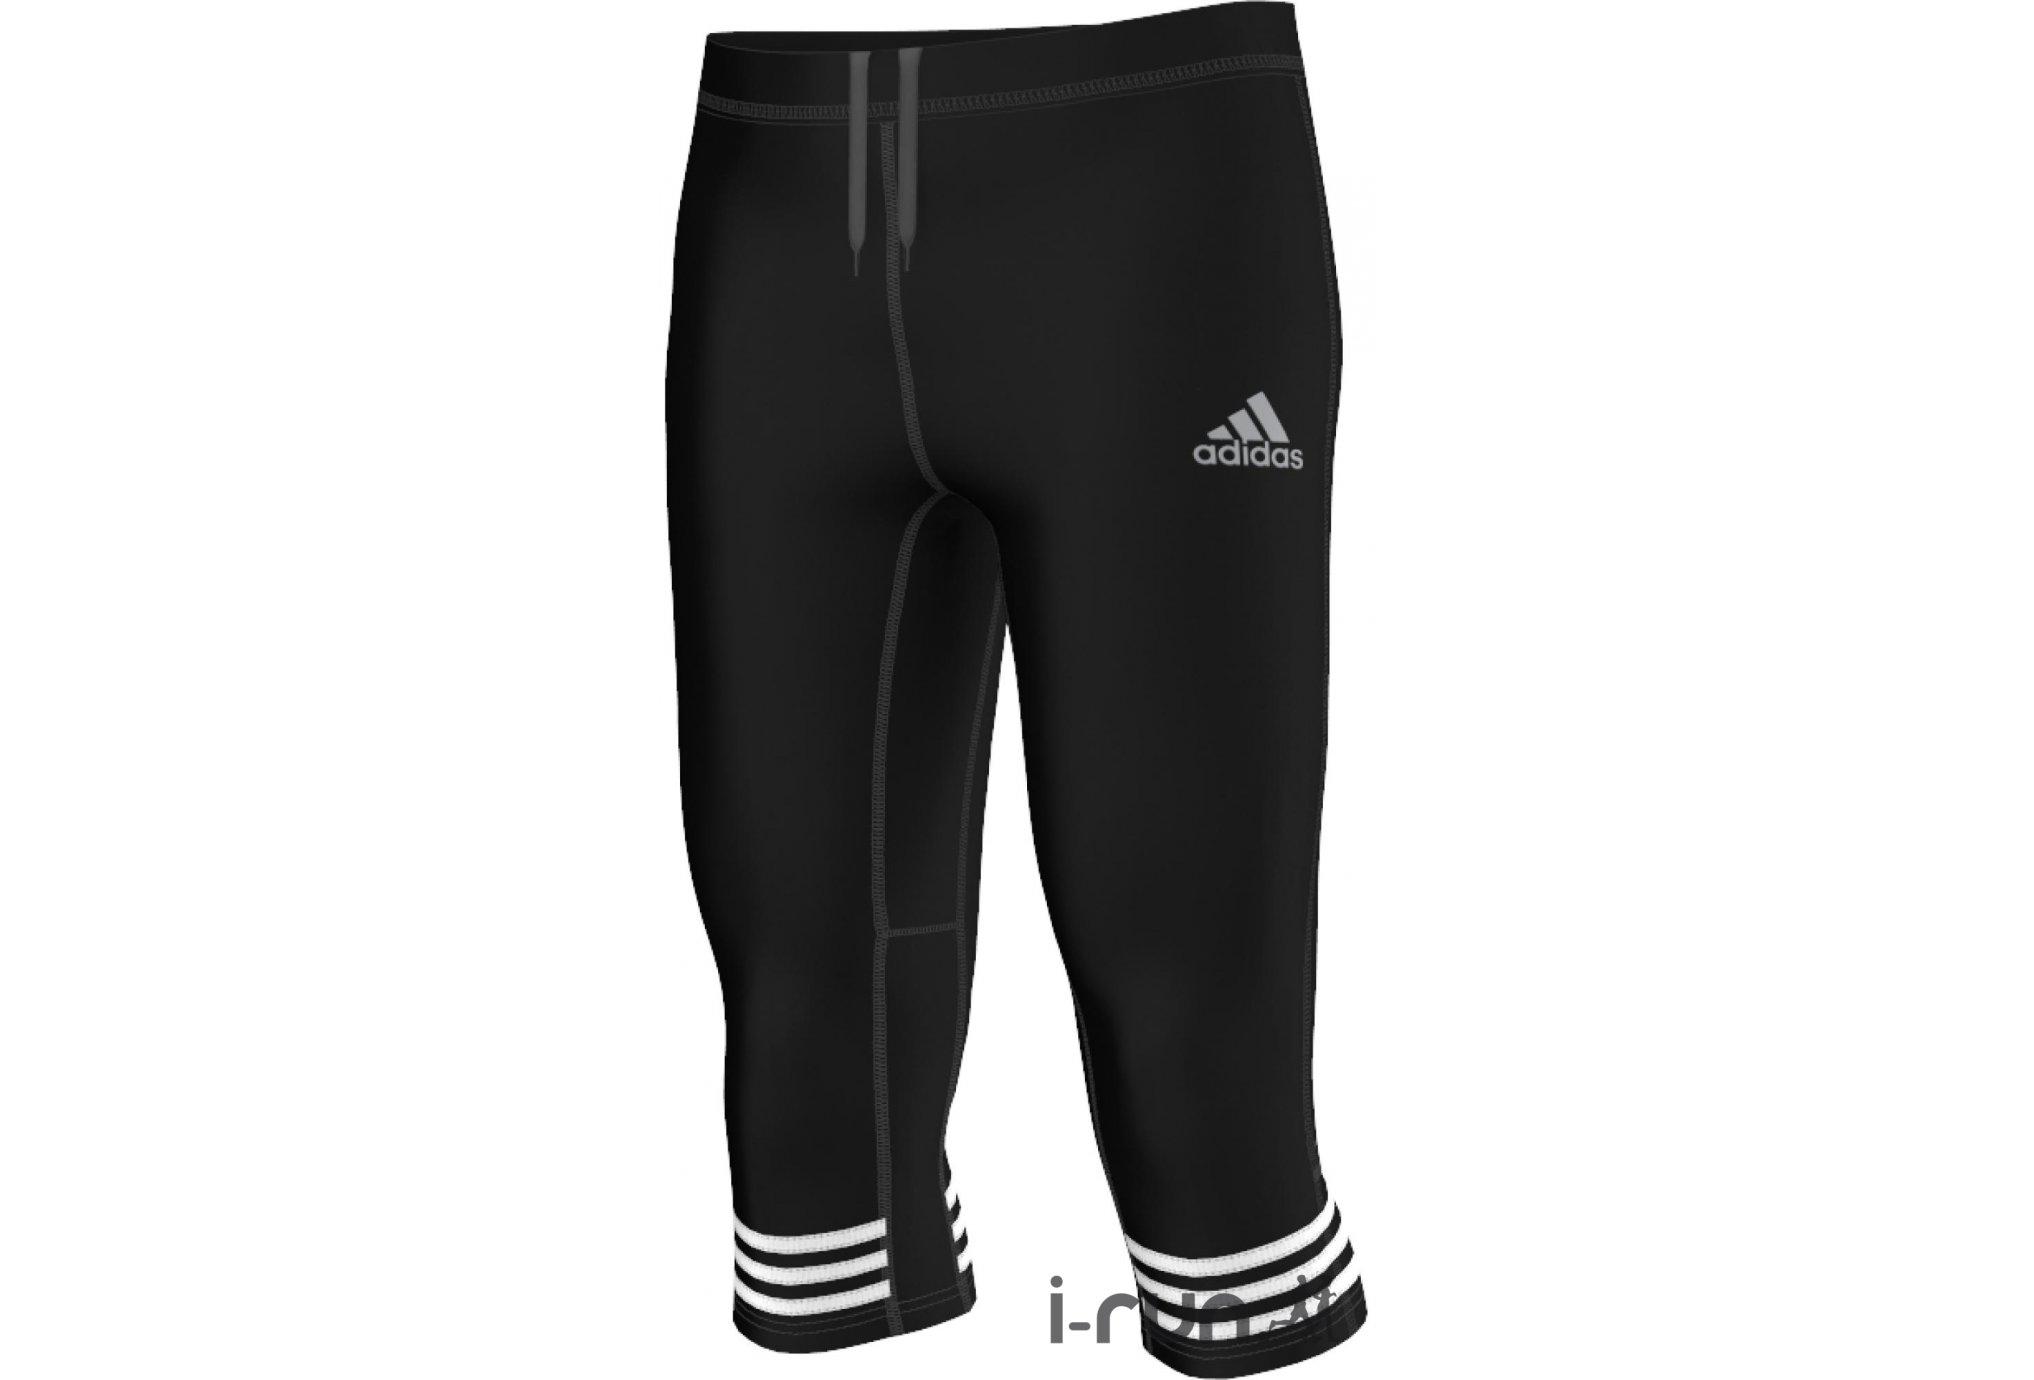 Adidas Collant 3/4 response m vêtement running homme